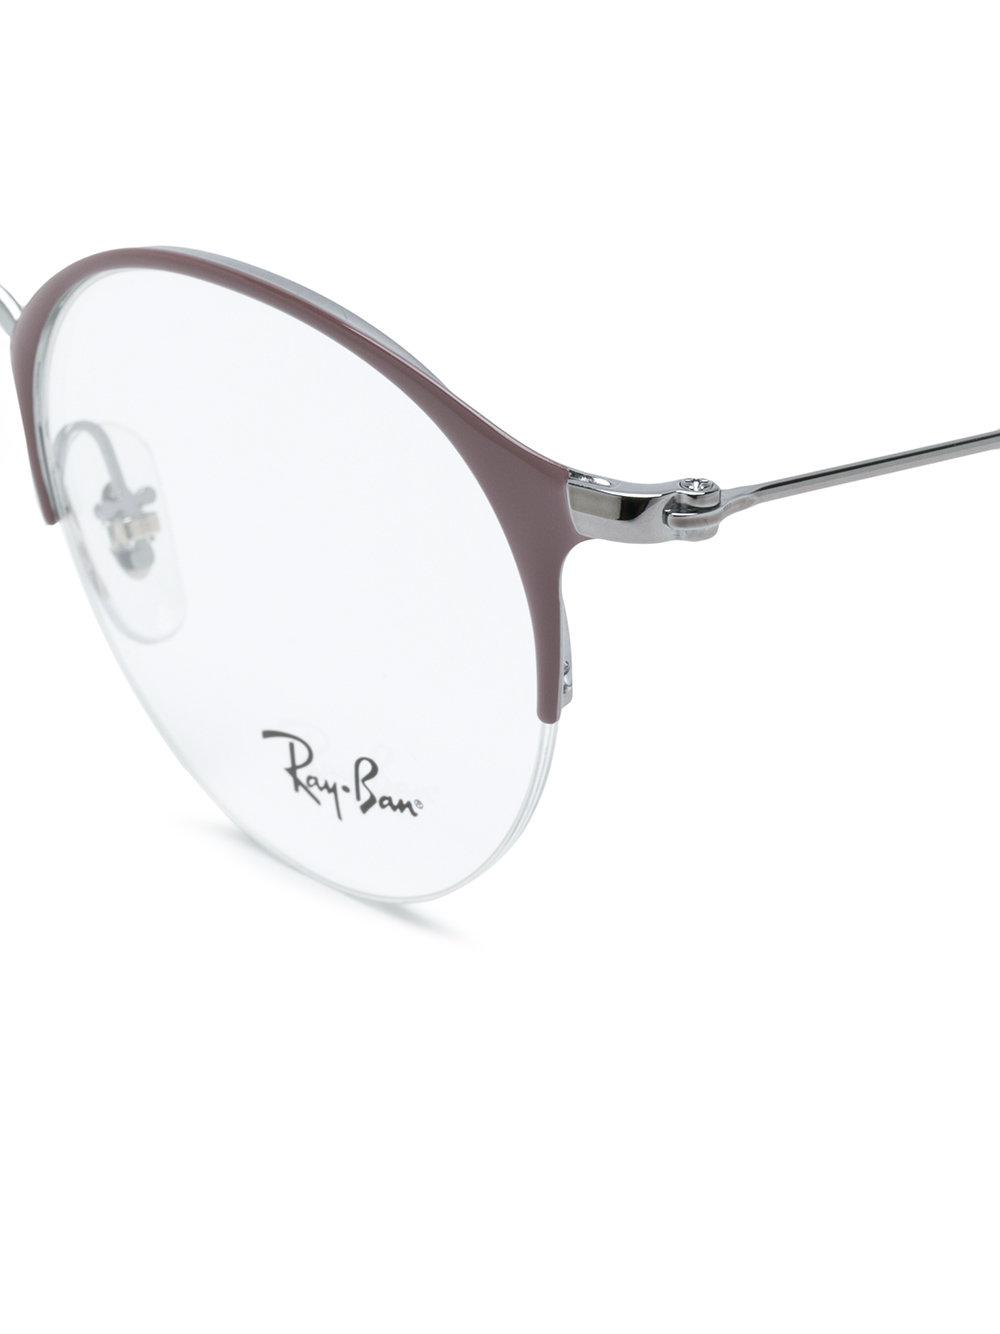 Lyst - Ray-Ban Round-frame Half-rim Glasses